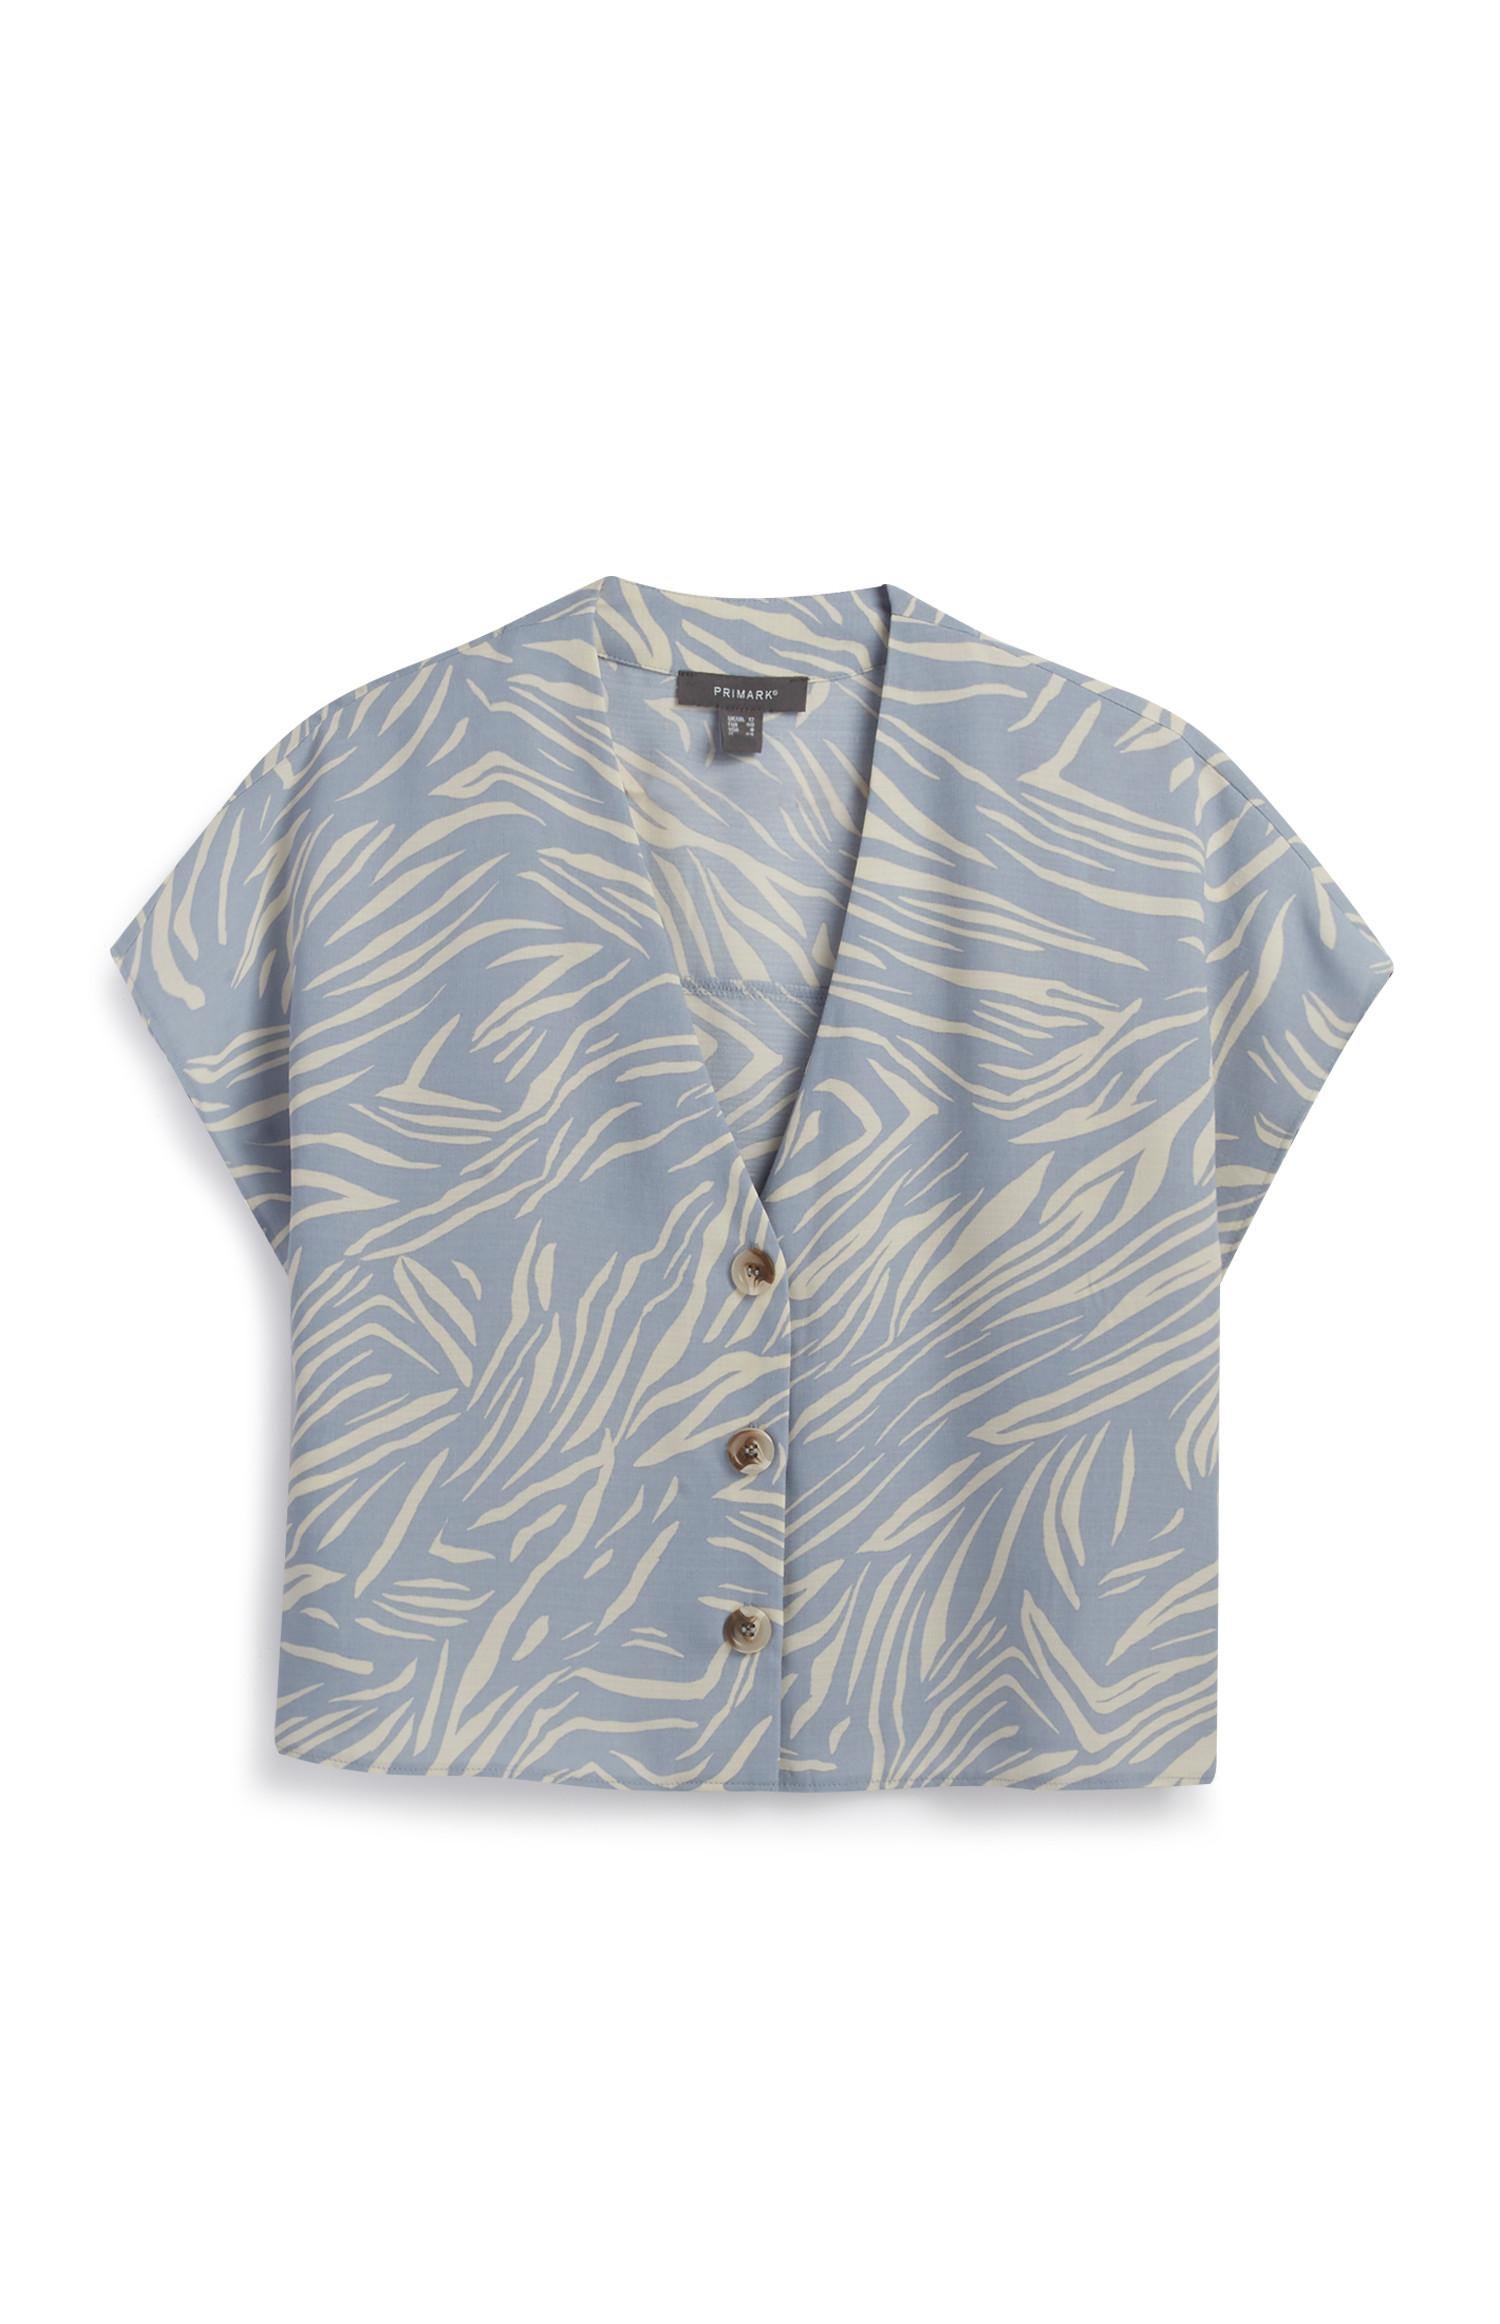 Blau gemusterte, kurze Bluse